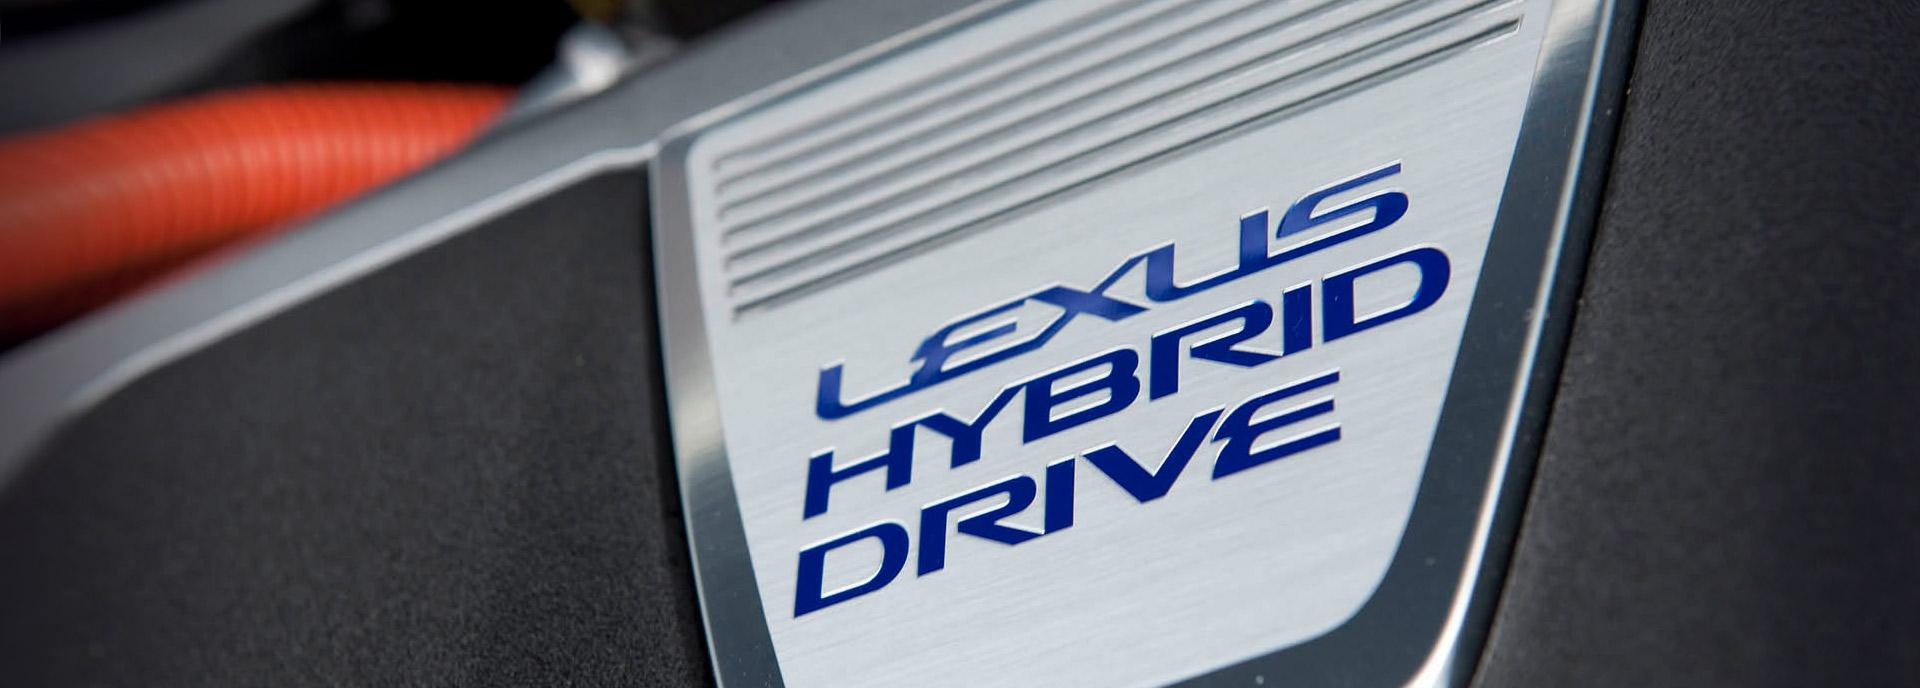 Logo Lexus Hybrid Drive